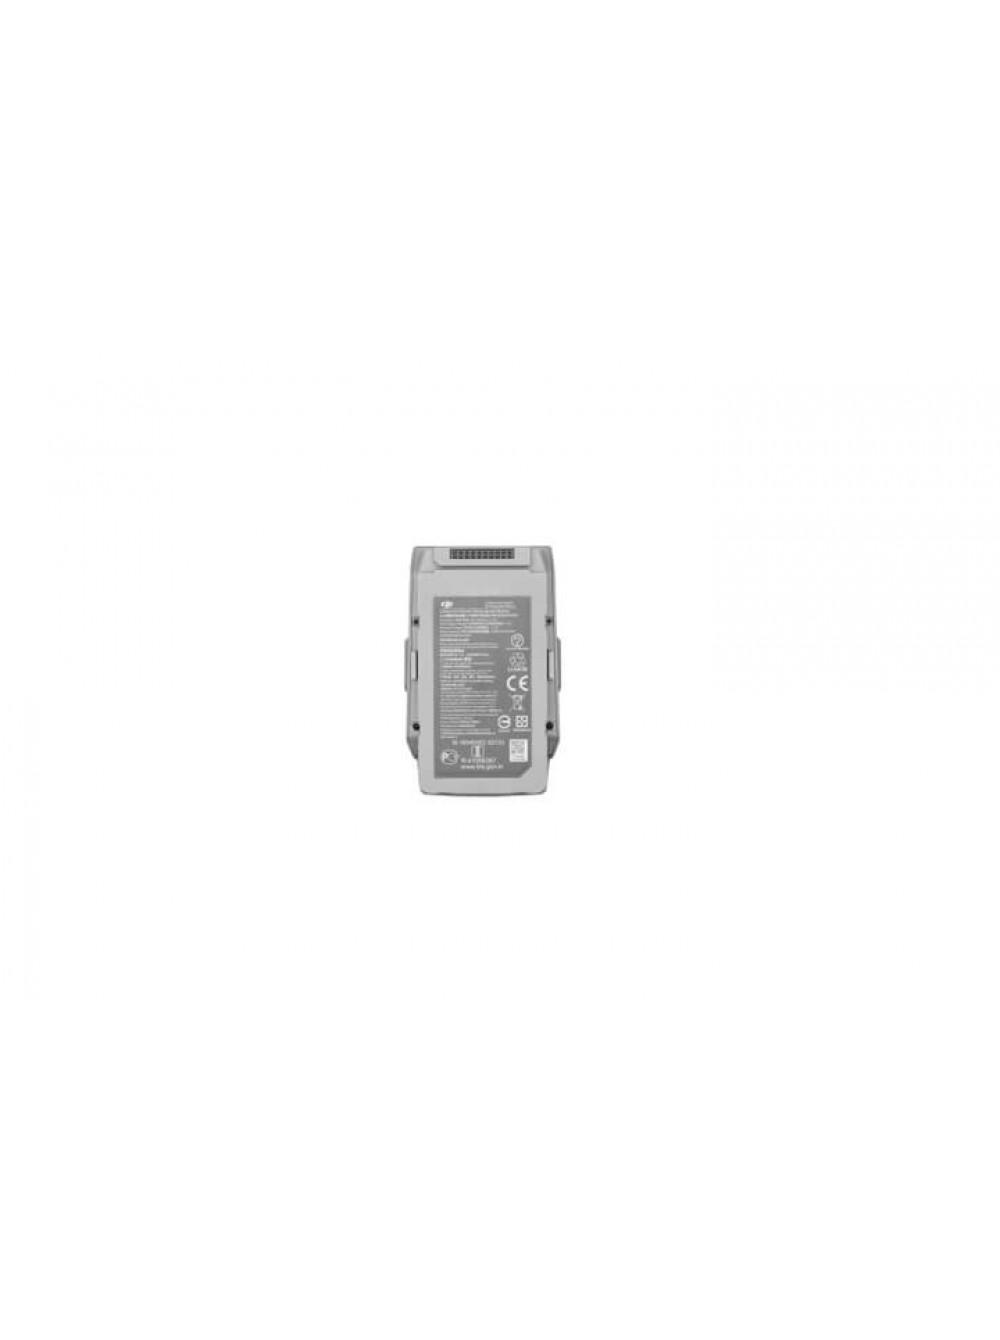 Интеллектуальный аккумулятор (батарея) для DJI Mavic Air 2